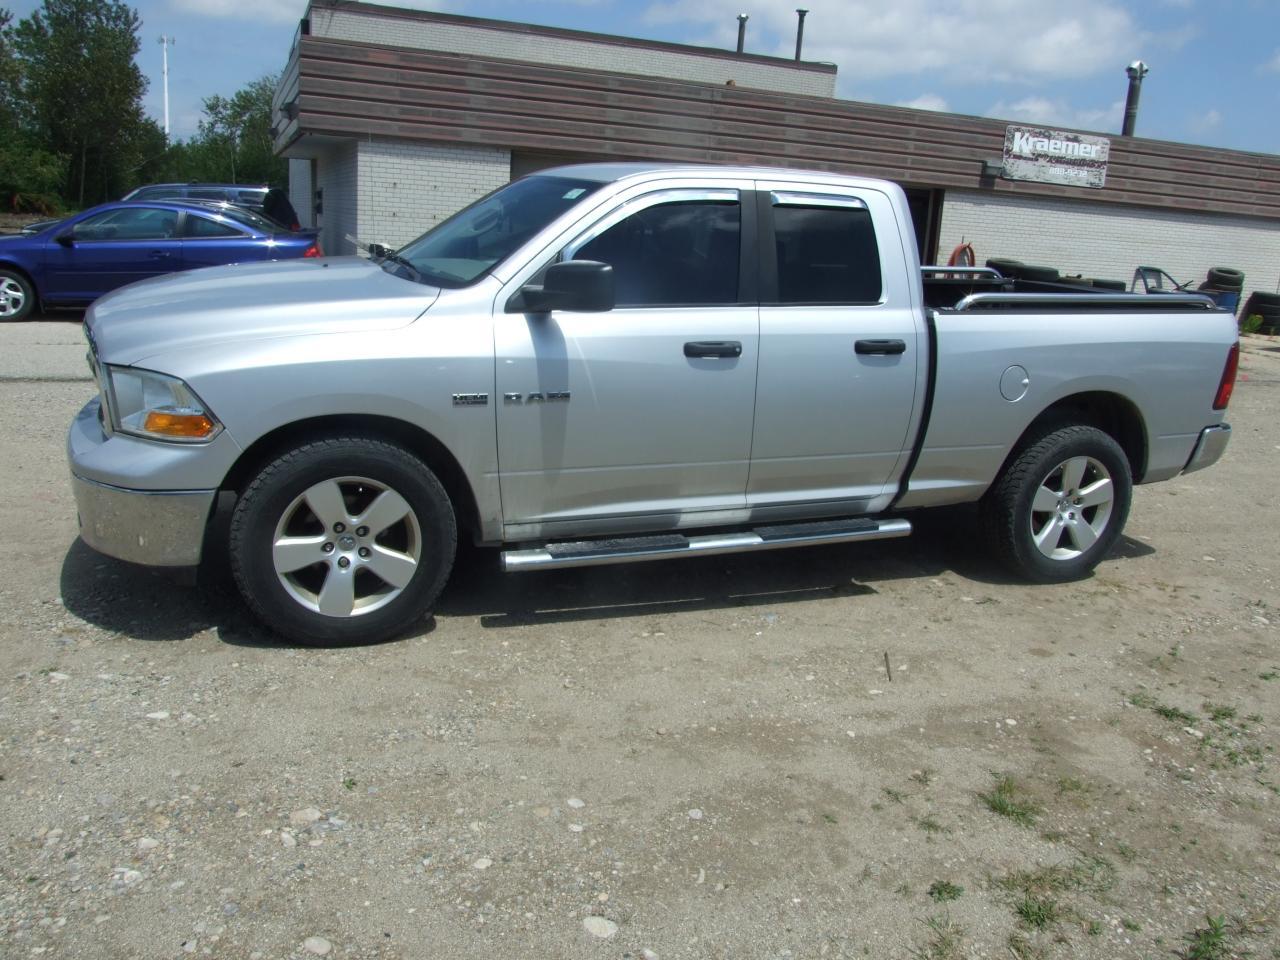 Photo of Silver 2010 Dodge Ram 1500